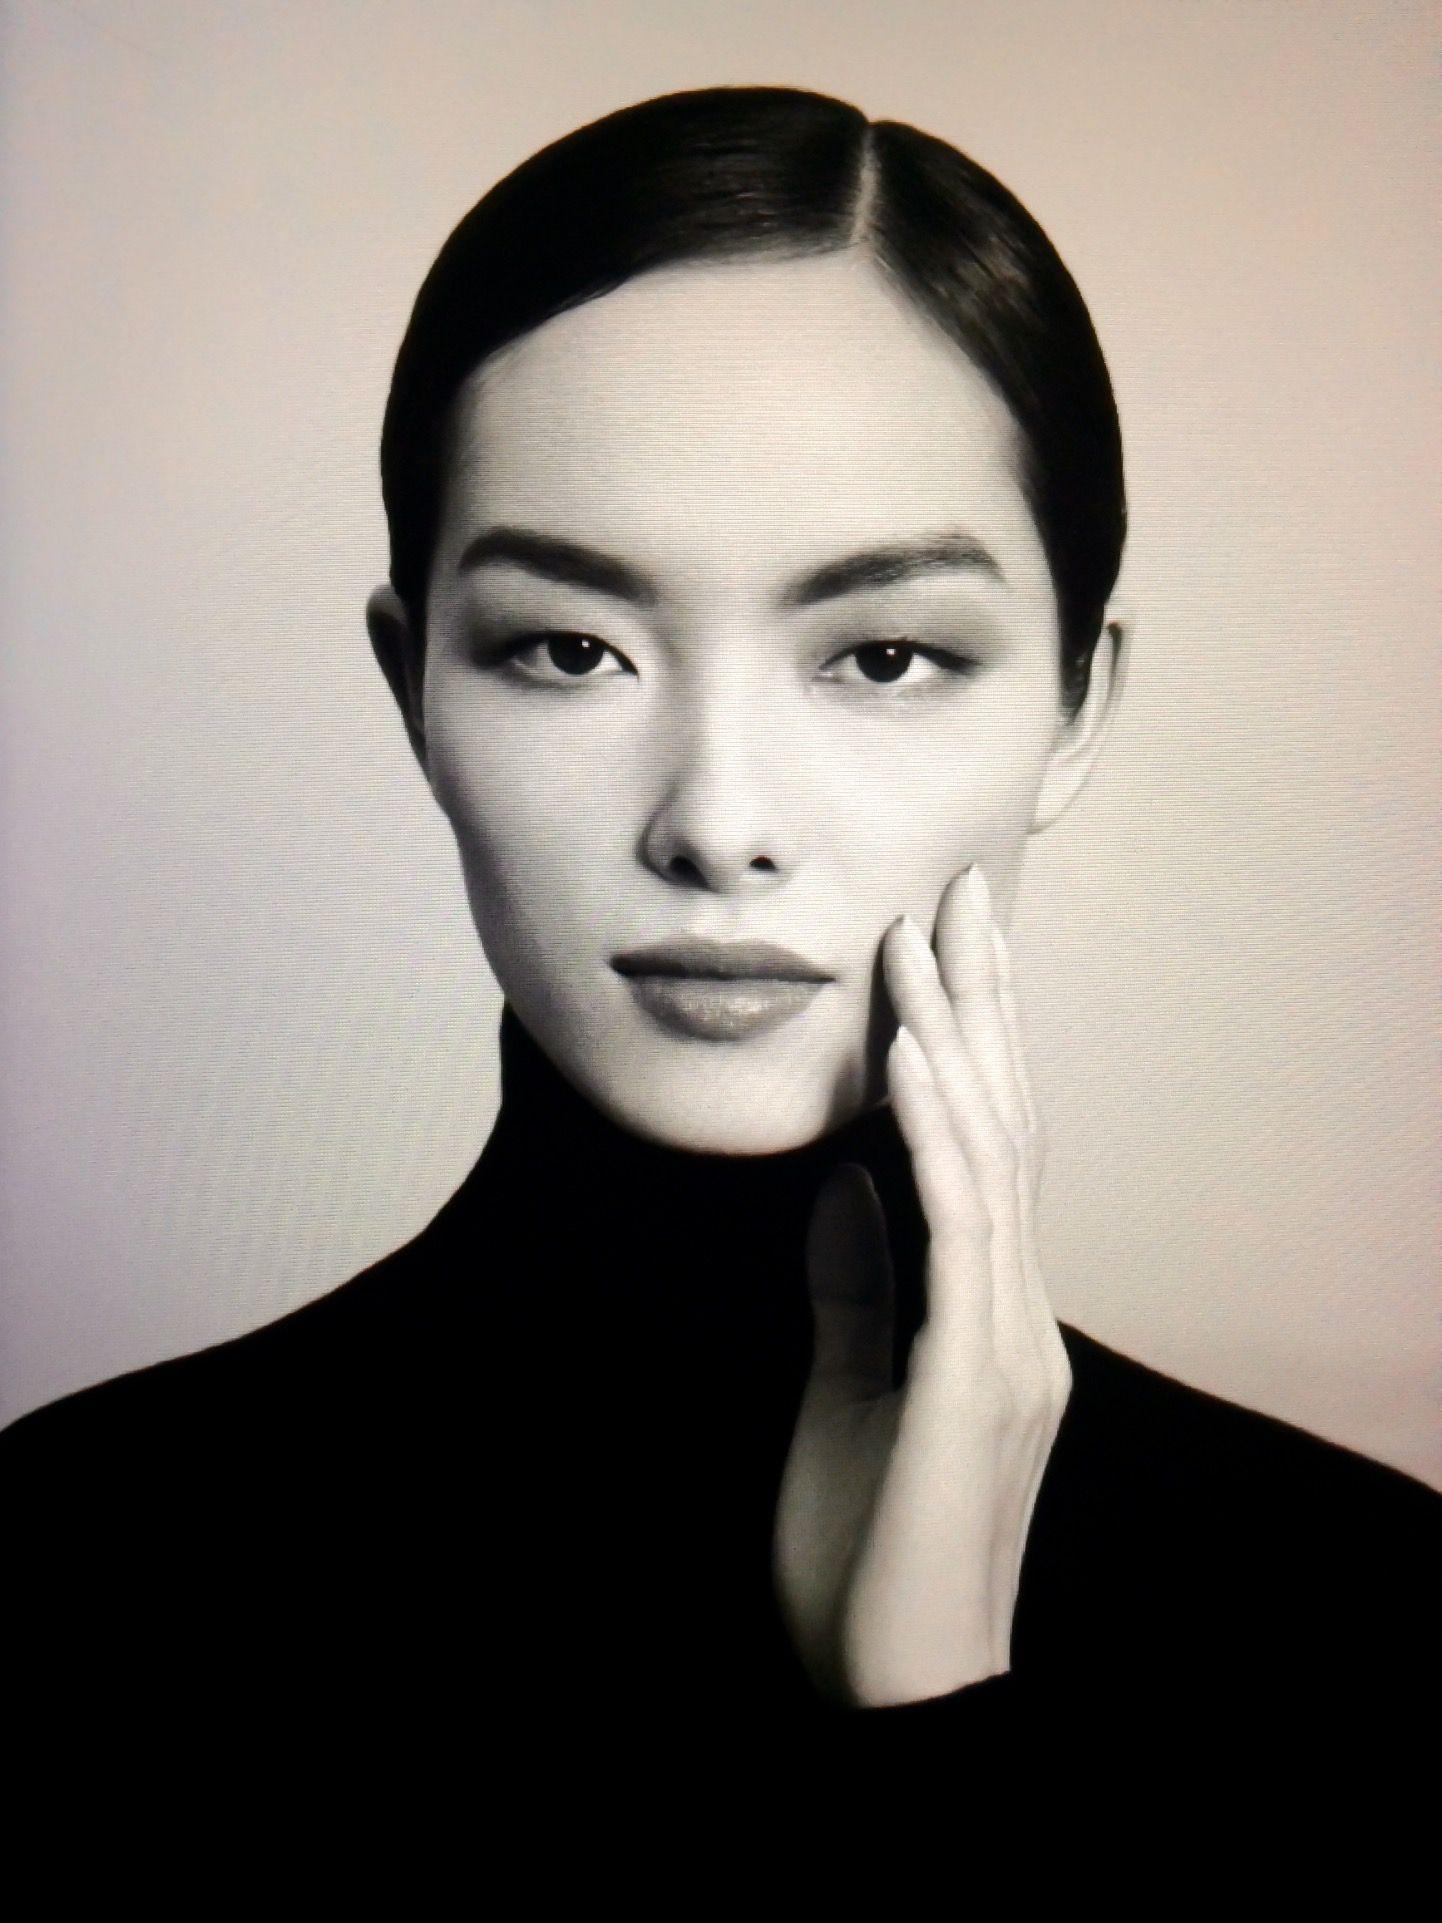 Asian beauty  Black hair and pale face  Pinterest  Pale face